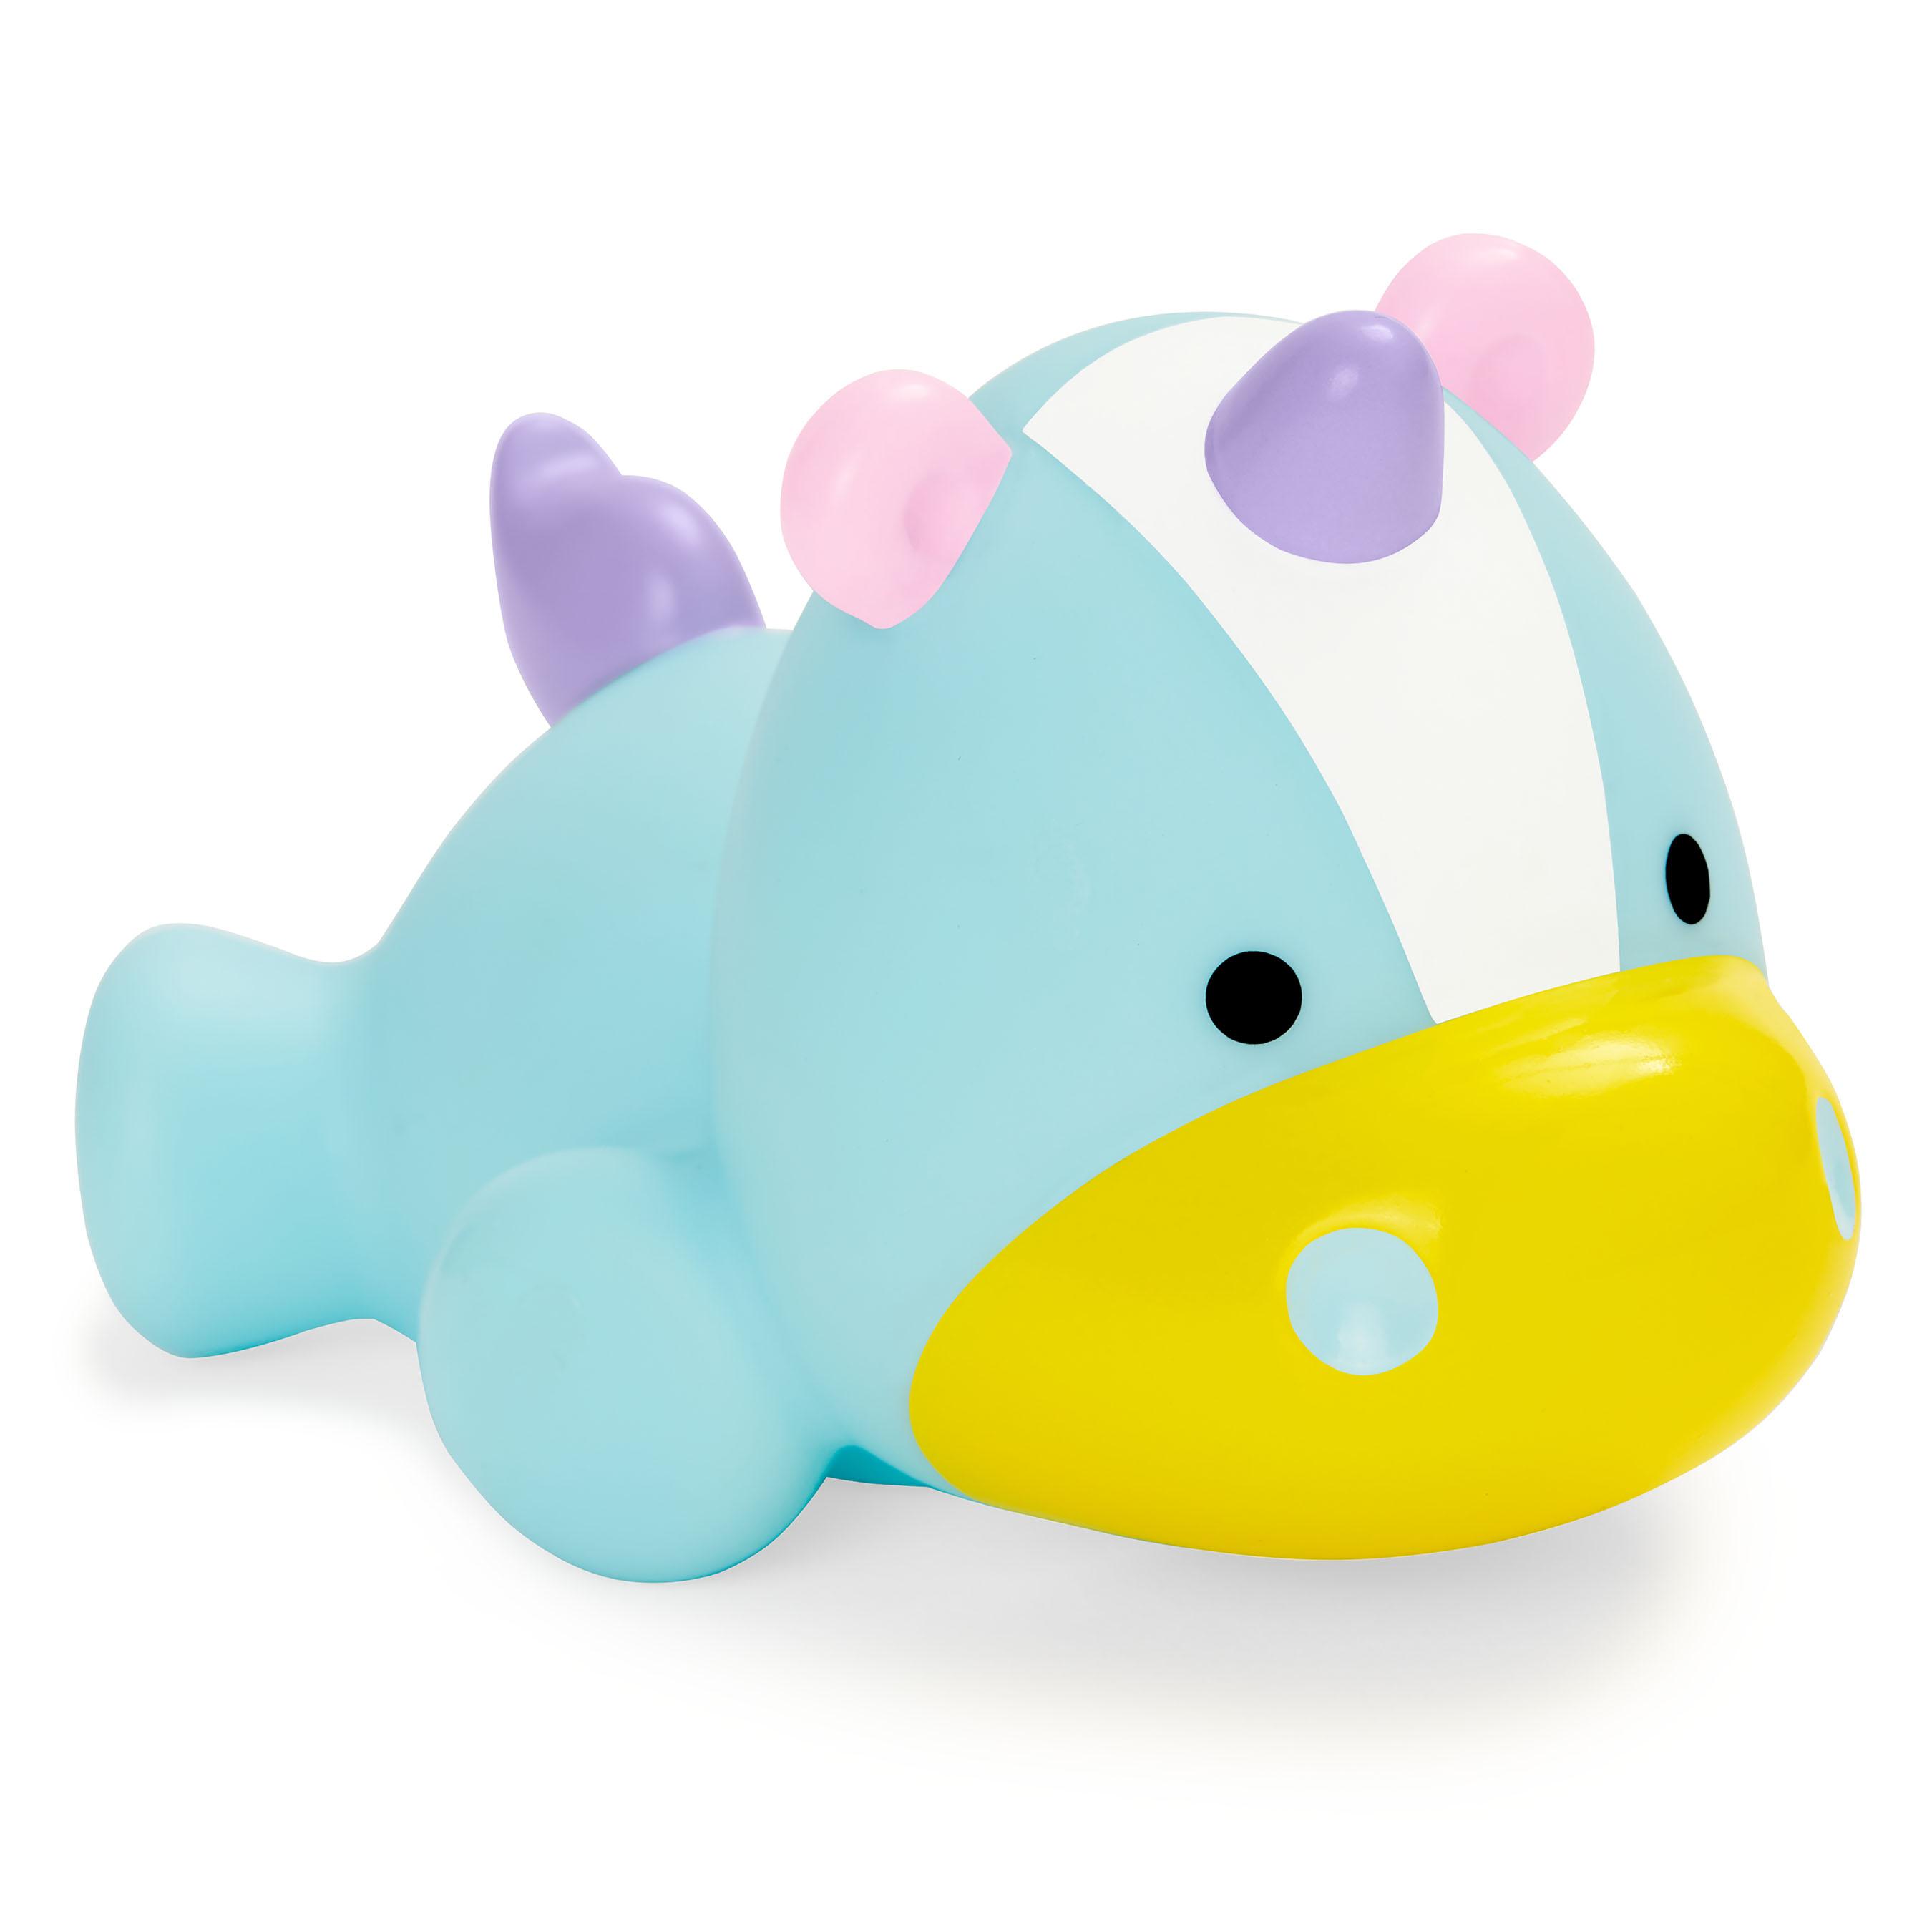 צעצוע אמבטיה - חד קרן מנצנץ